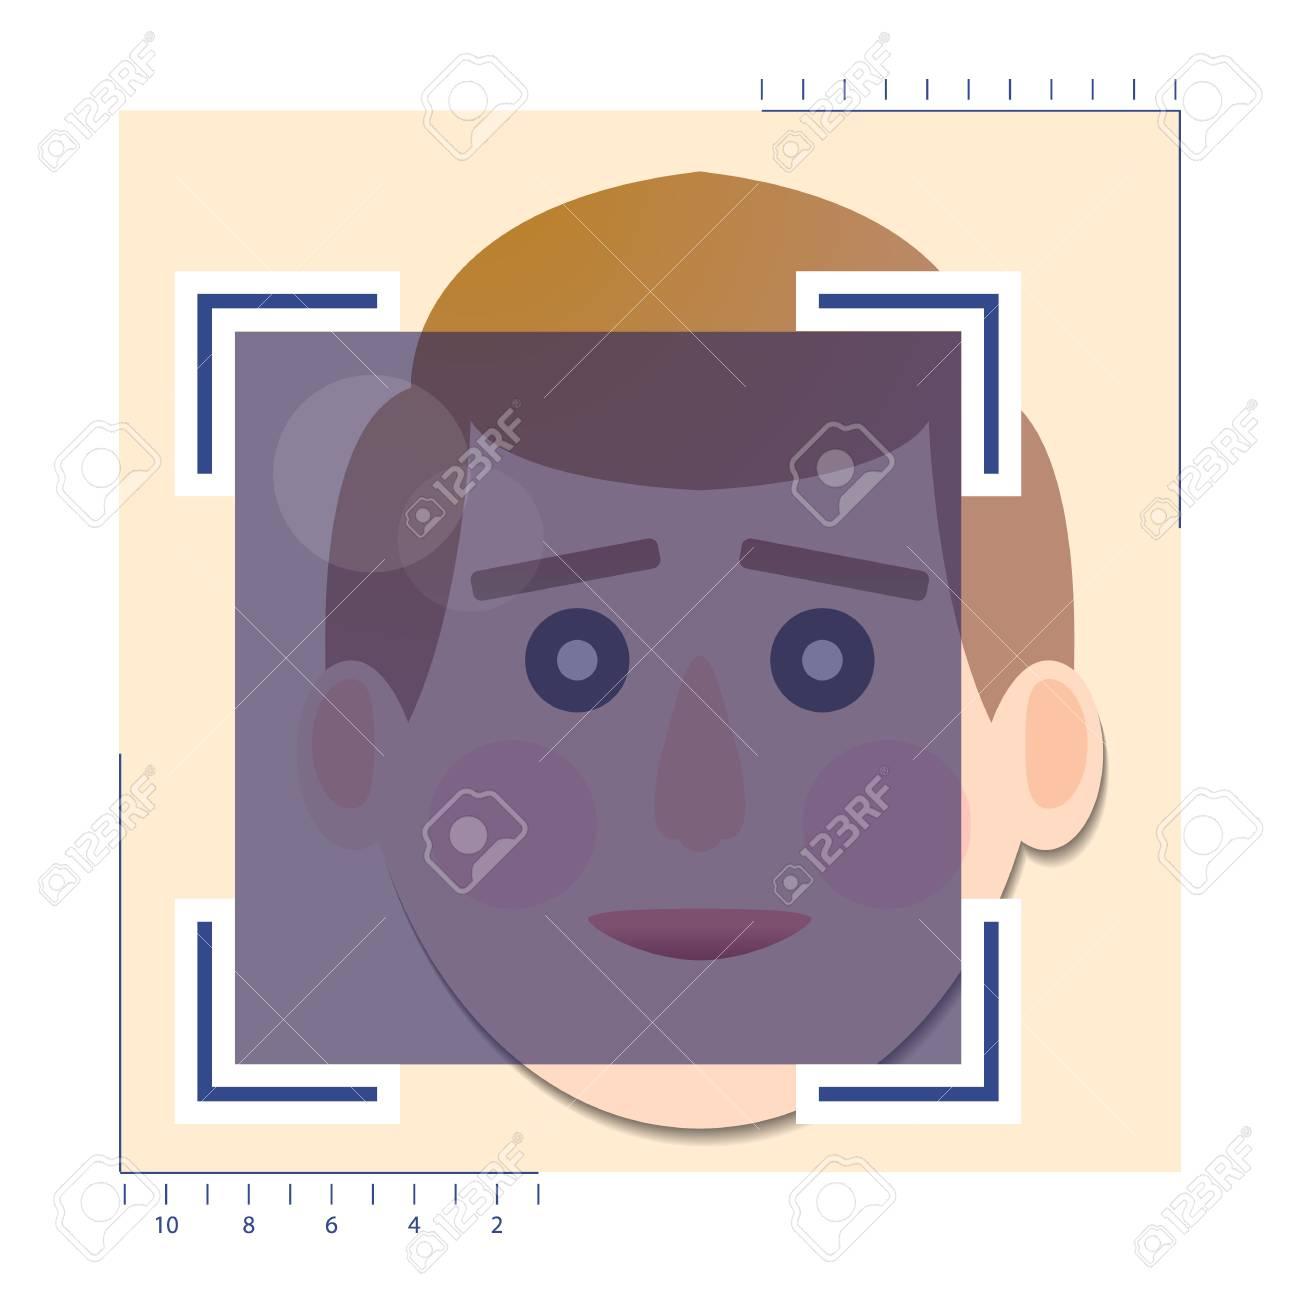 face detection biometrical identification ロイヤリティフリー